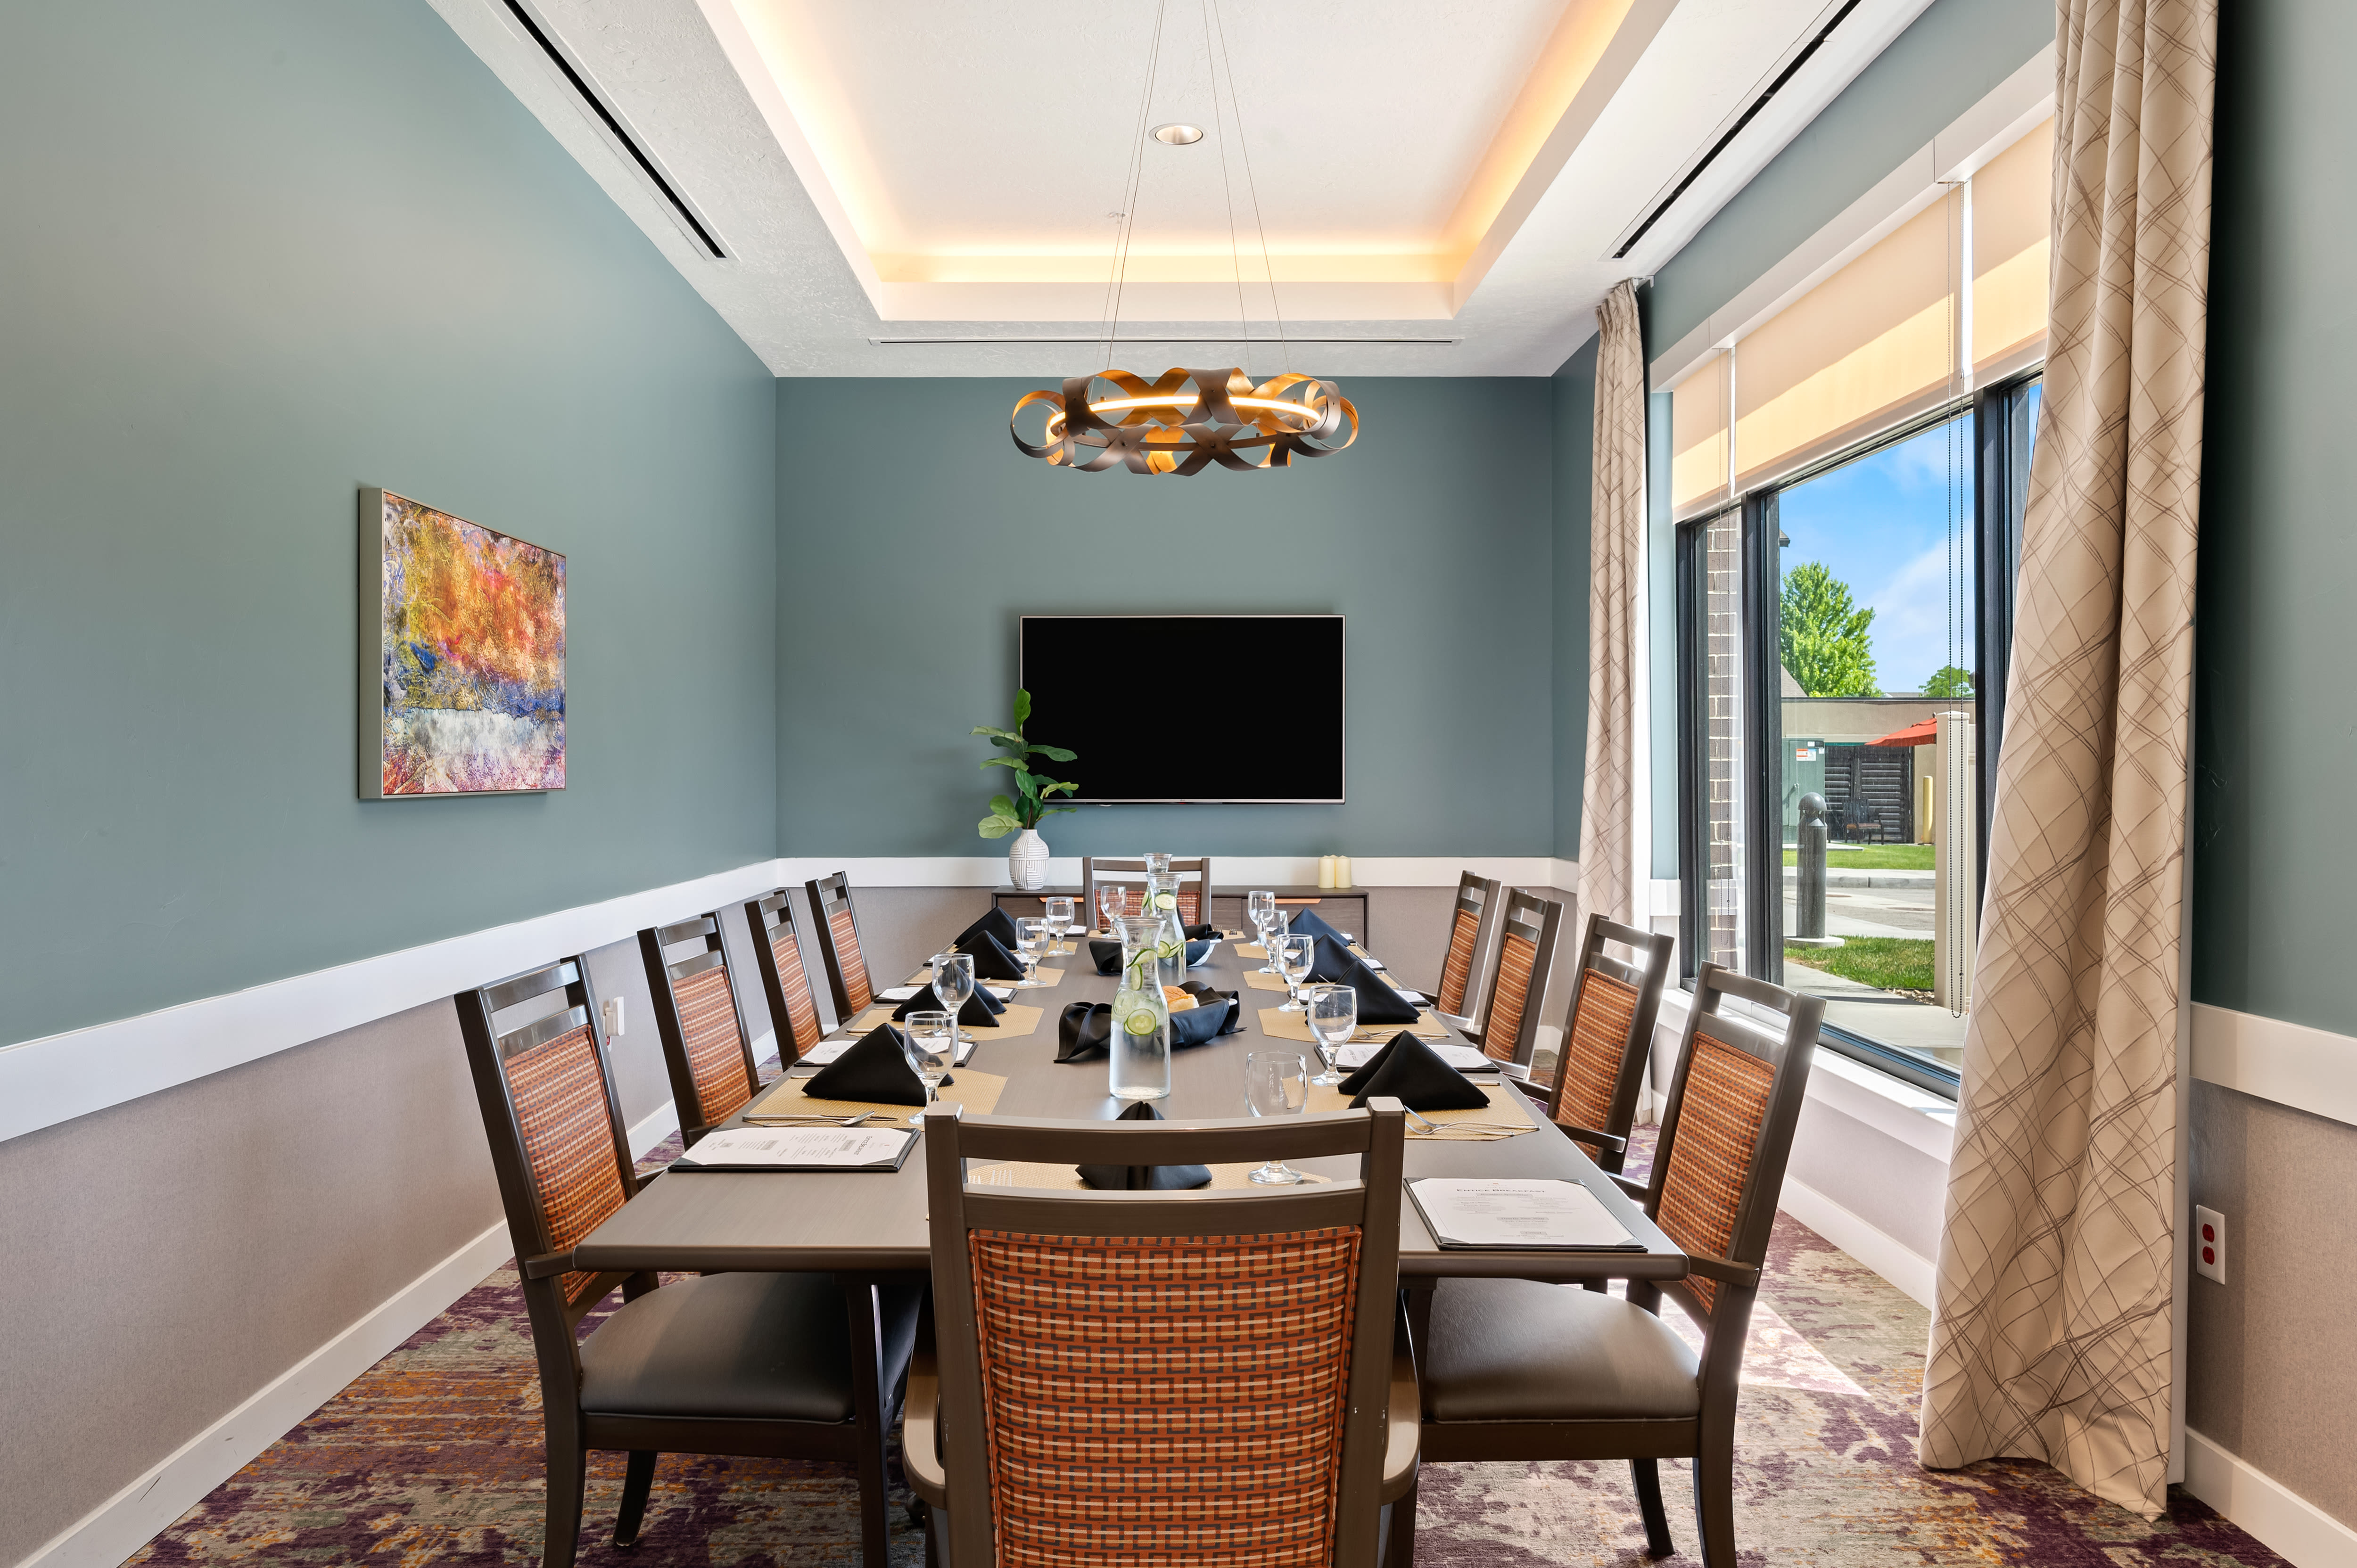 A private dining room at Anthology of South Jordan in South Jordan, Utah